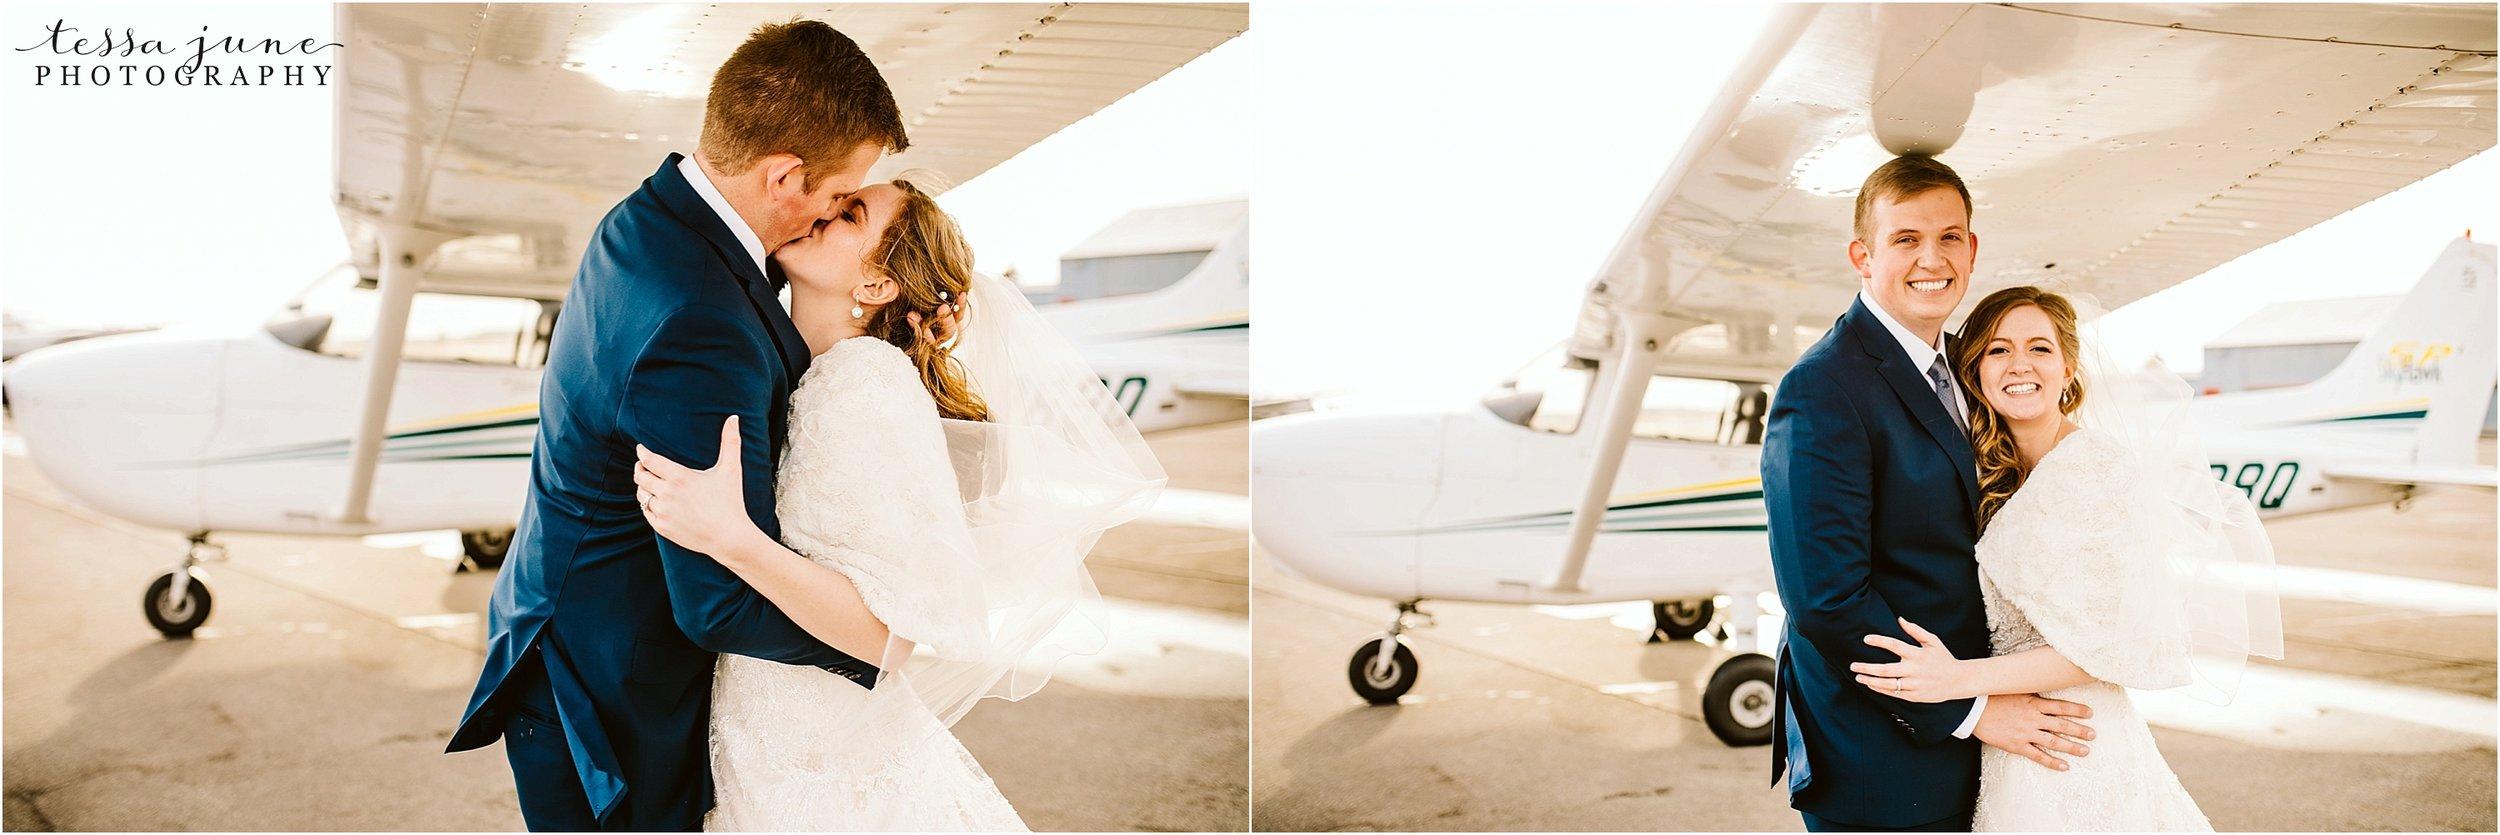 winter-wedding-in-eden-prairie-barn-minnesota-airplane-105.jpg